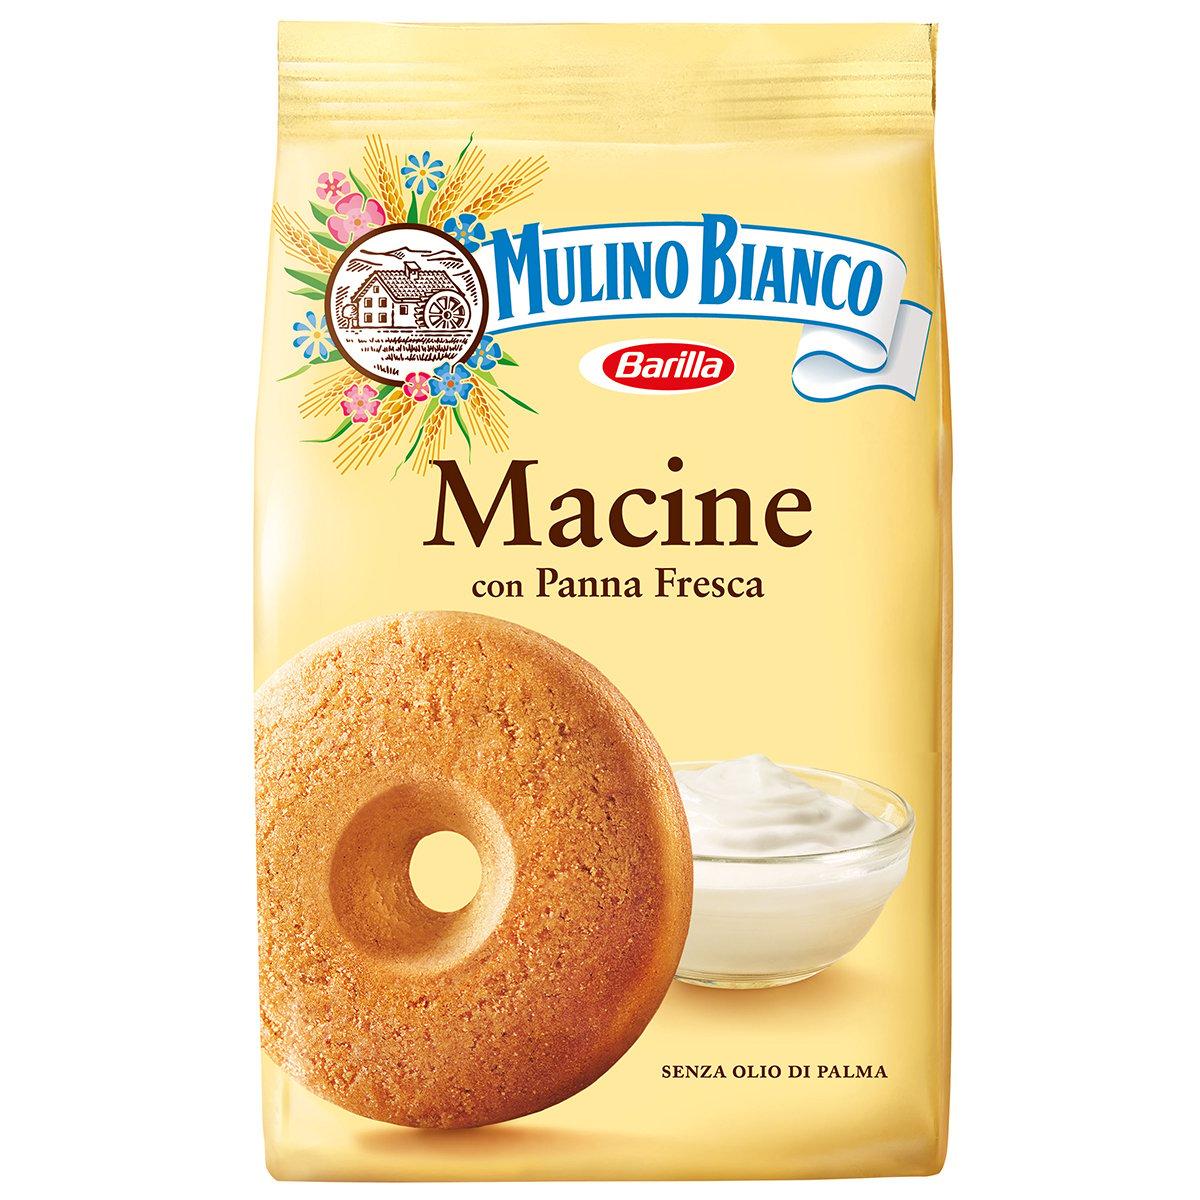 Biscuiti Macine cu smantana proaspata Mulino Bianco, 350 g imagine